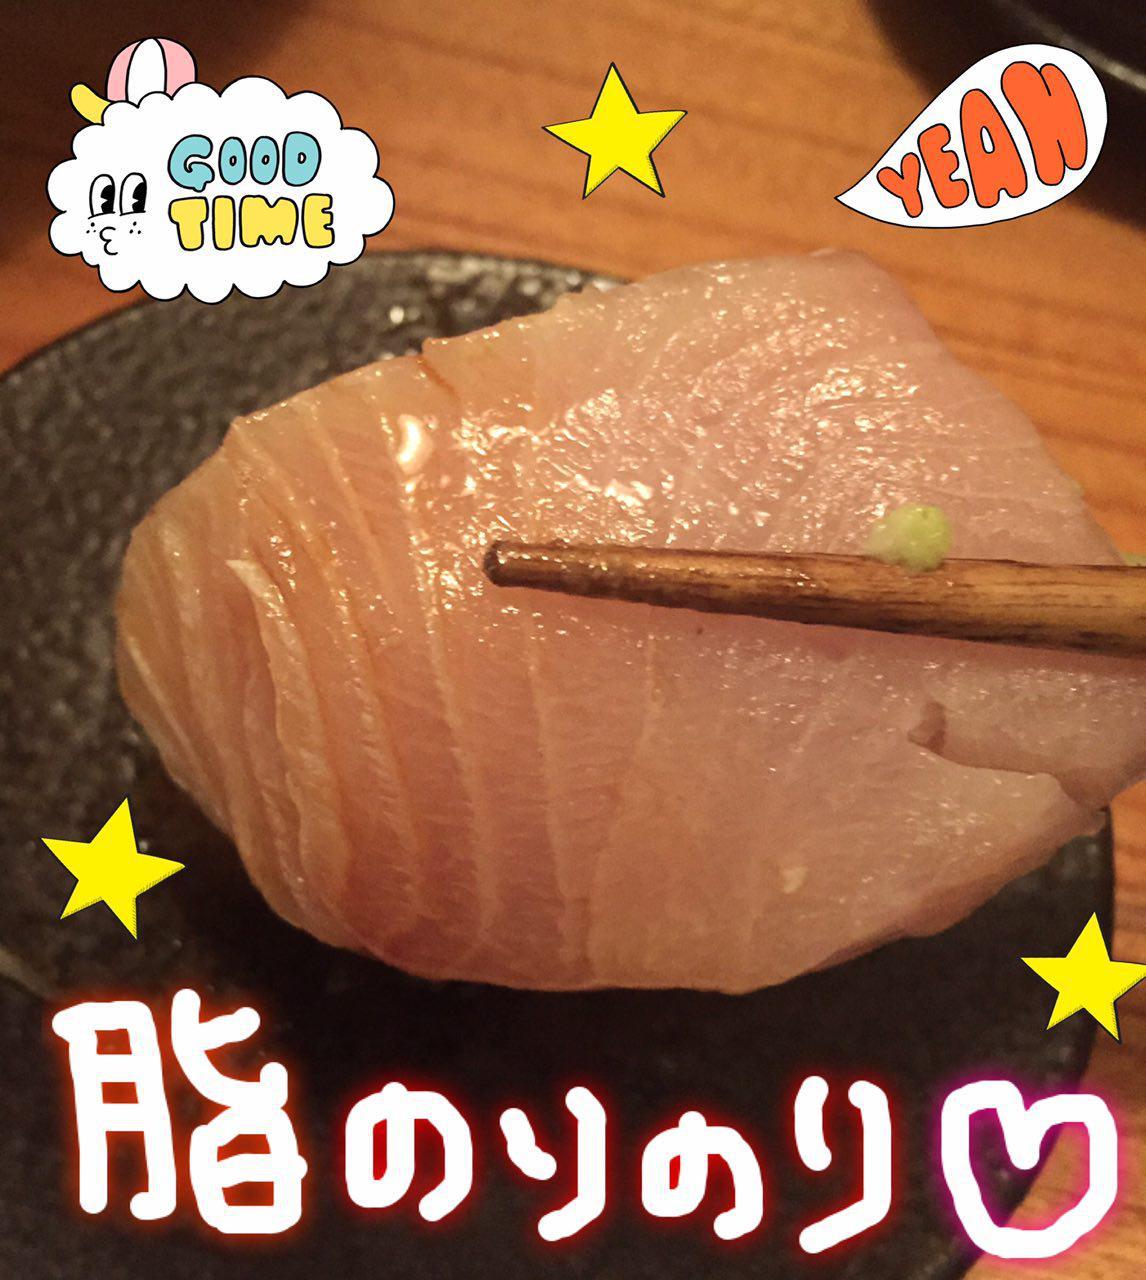 photo_2017-02-01_23-04-37.jpg